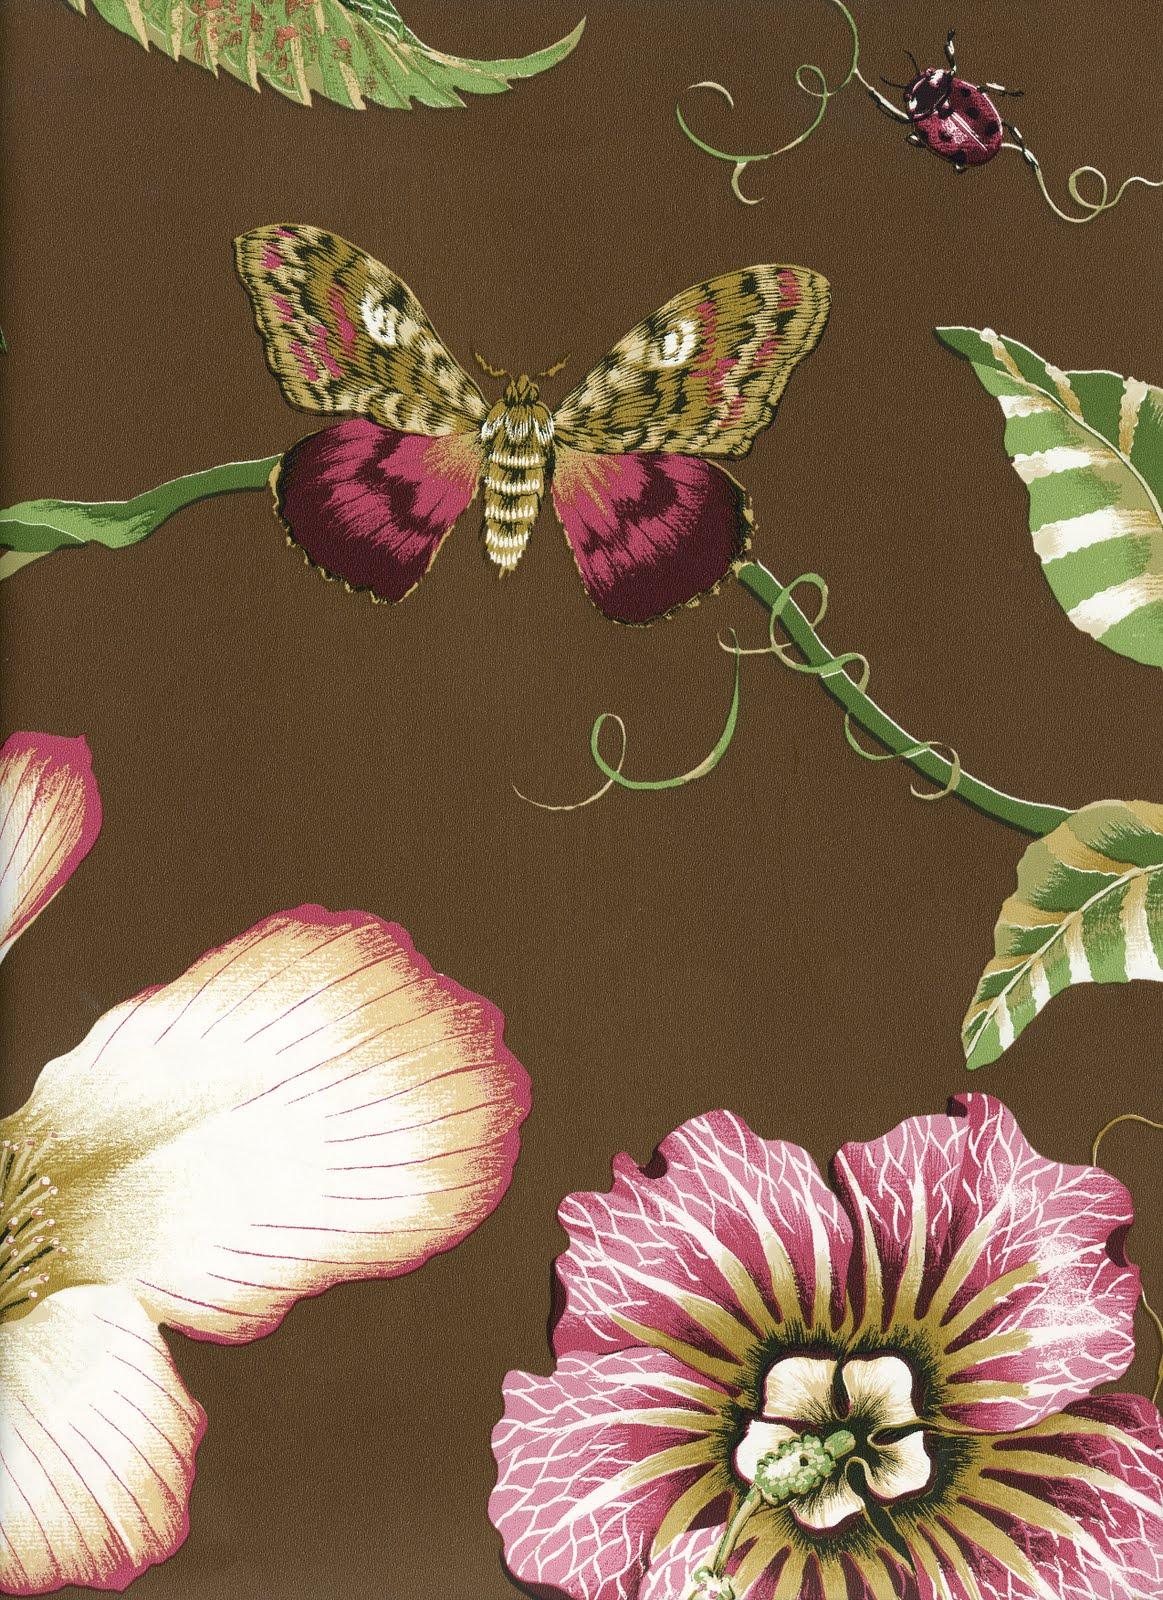 trololo blogg Wallpaper You Can Color 1163x1600